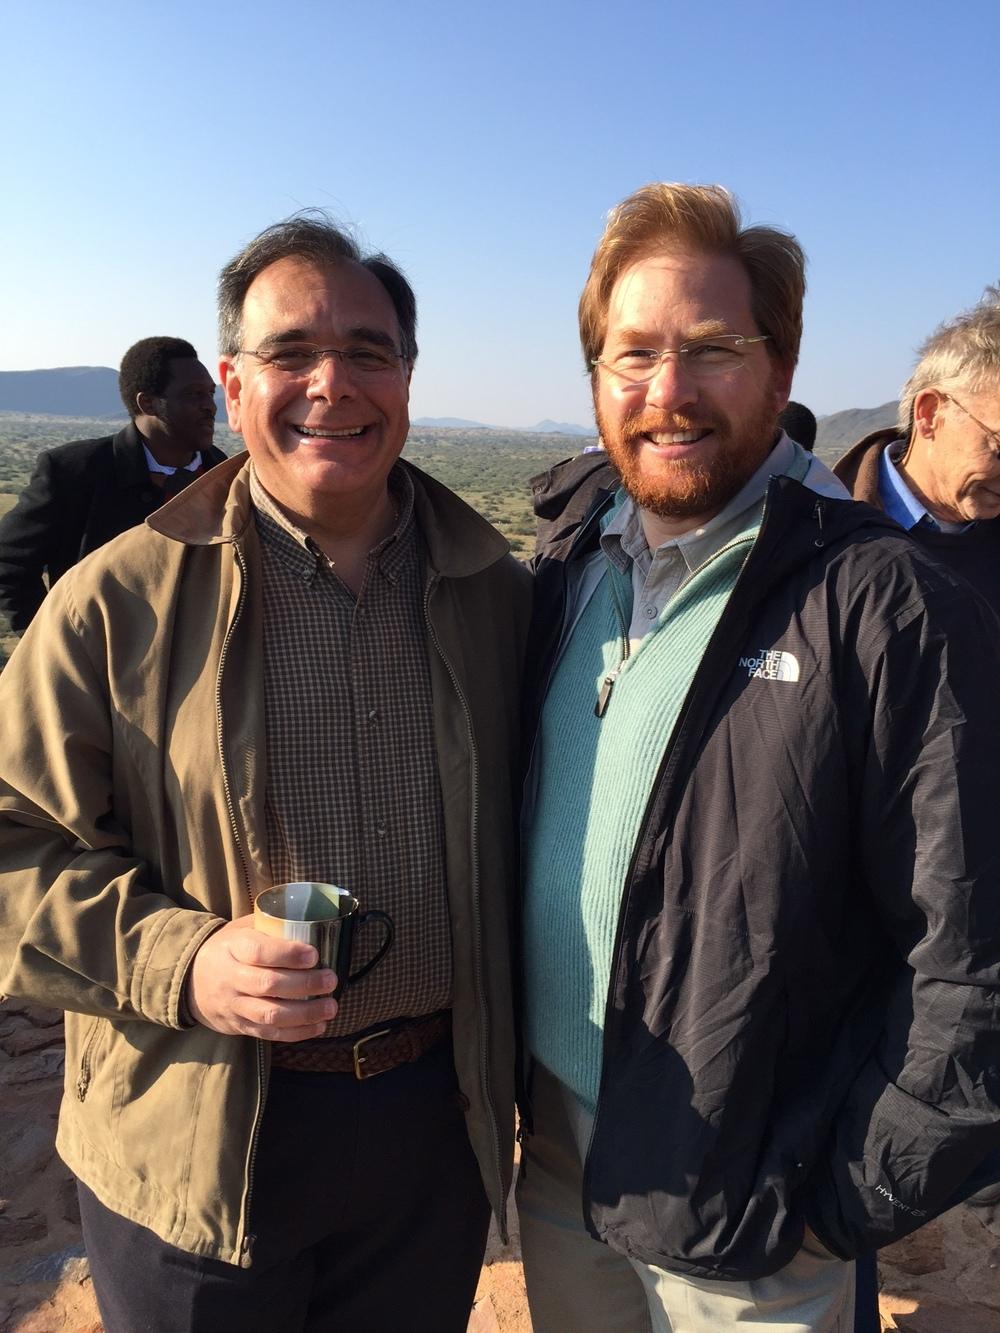 From left, Dr. Daboub and Jonathan Oppenheimer of Anglo American, De Beers, Oppenheimer Diamonds. President of the Brenthurst Foundation